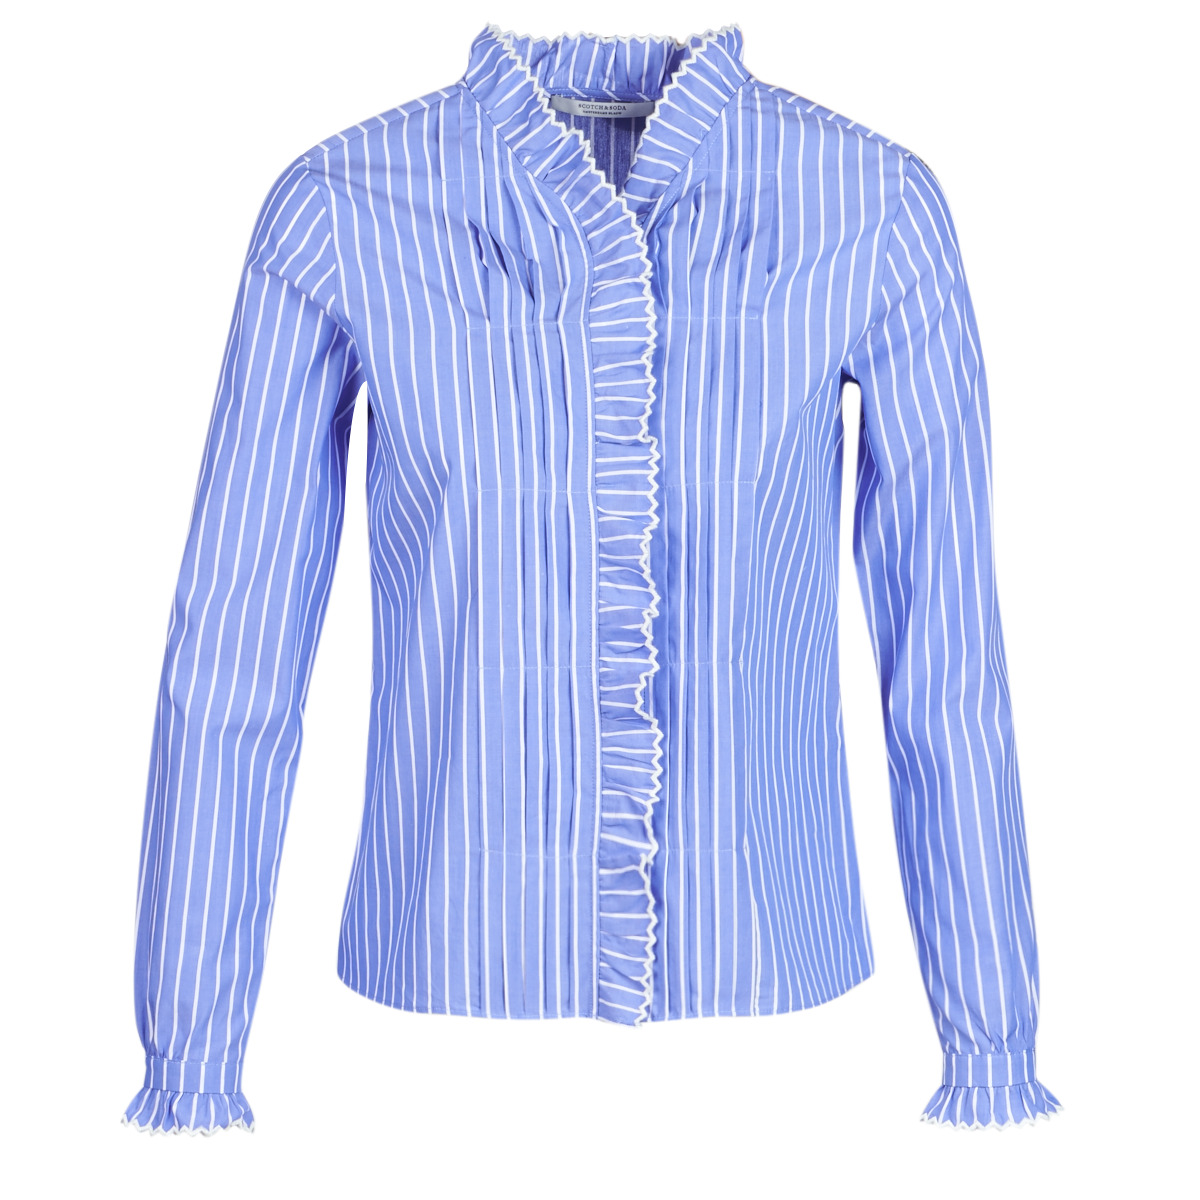 Skjorter / Skjortebluser Maison Scotch  -